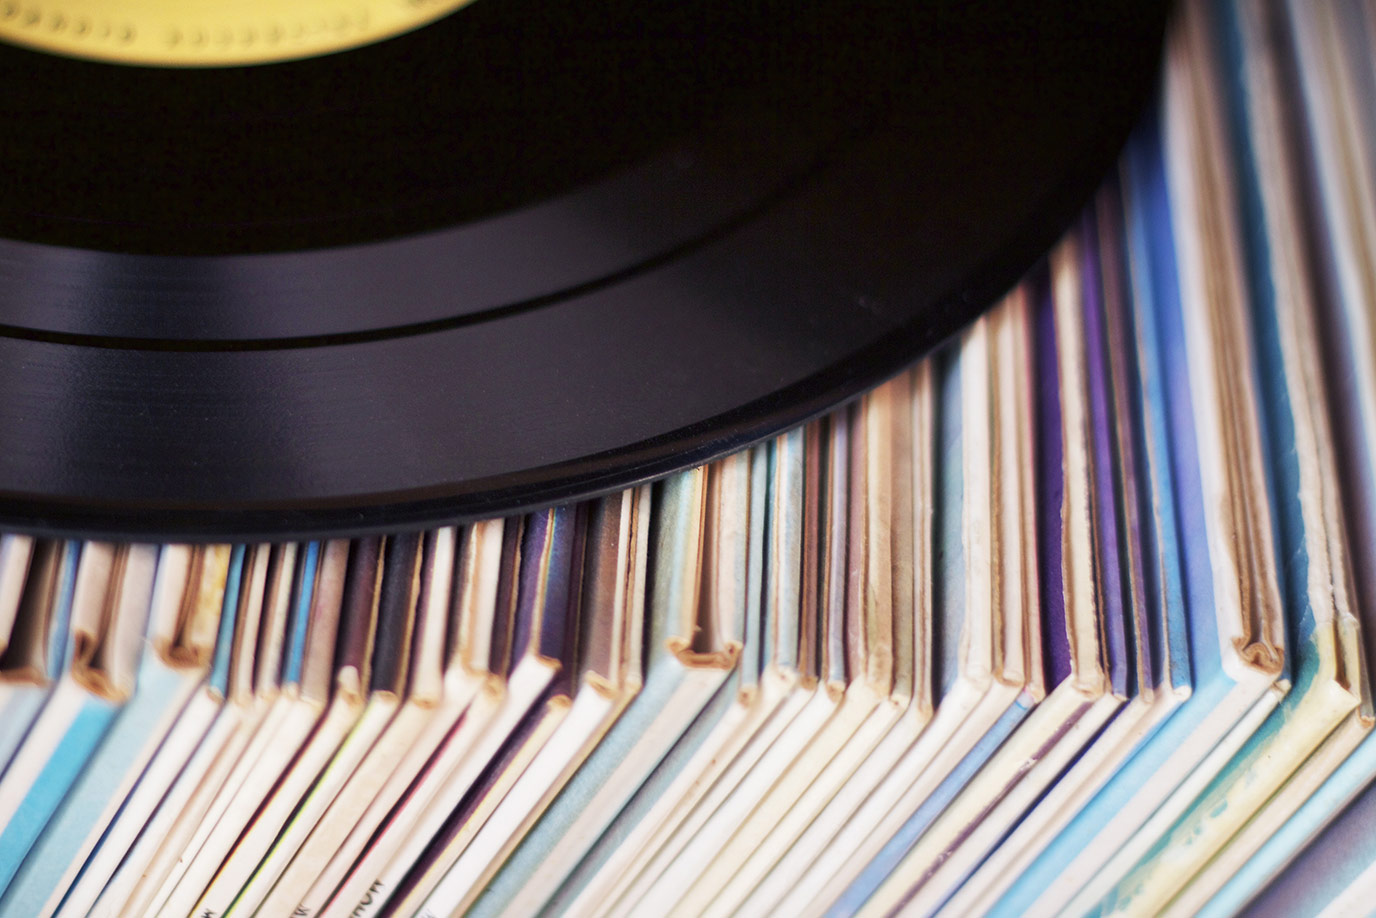 Kick-start you vinyl collection